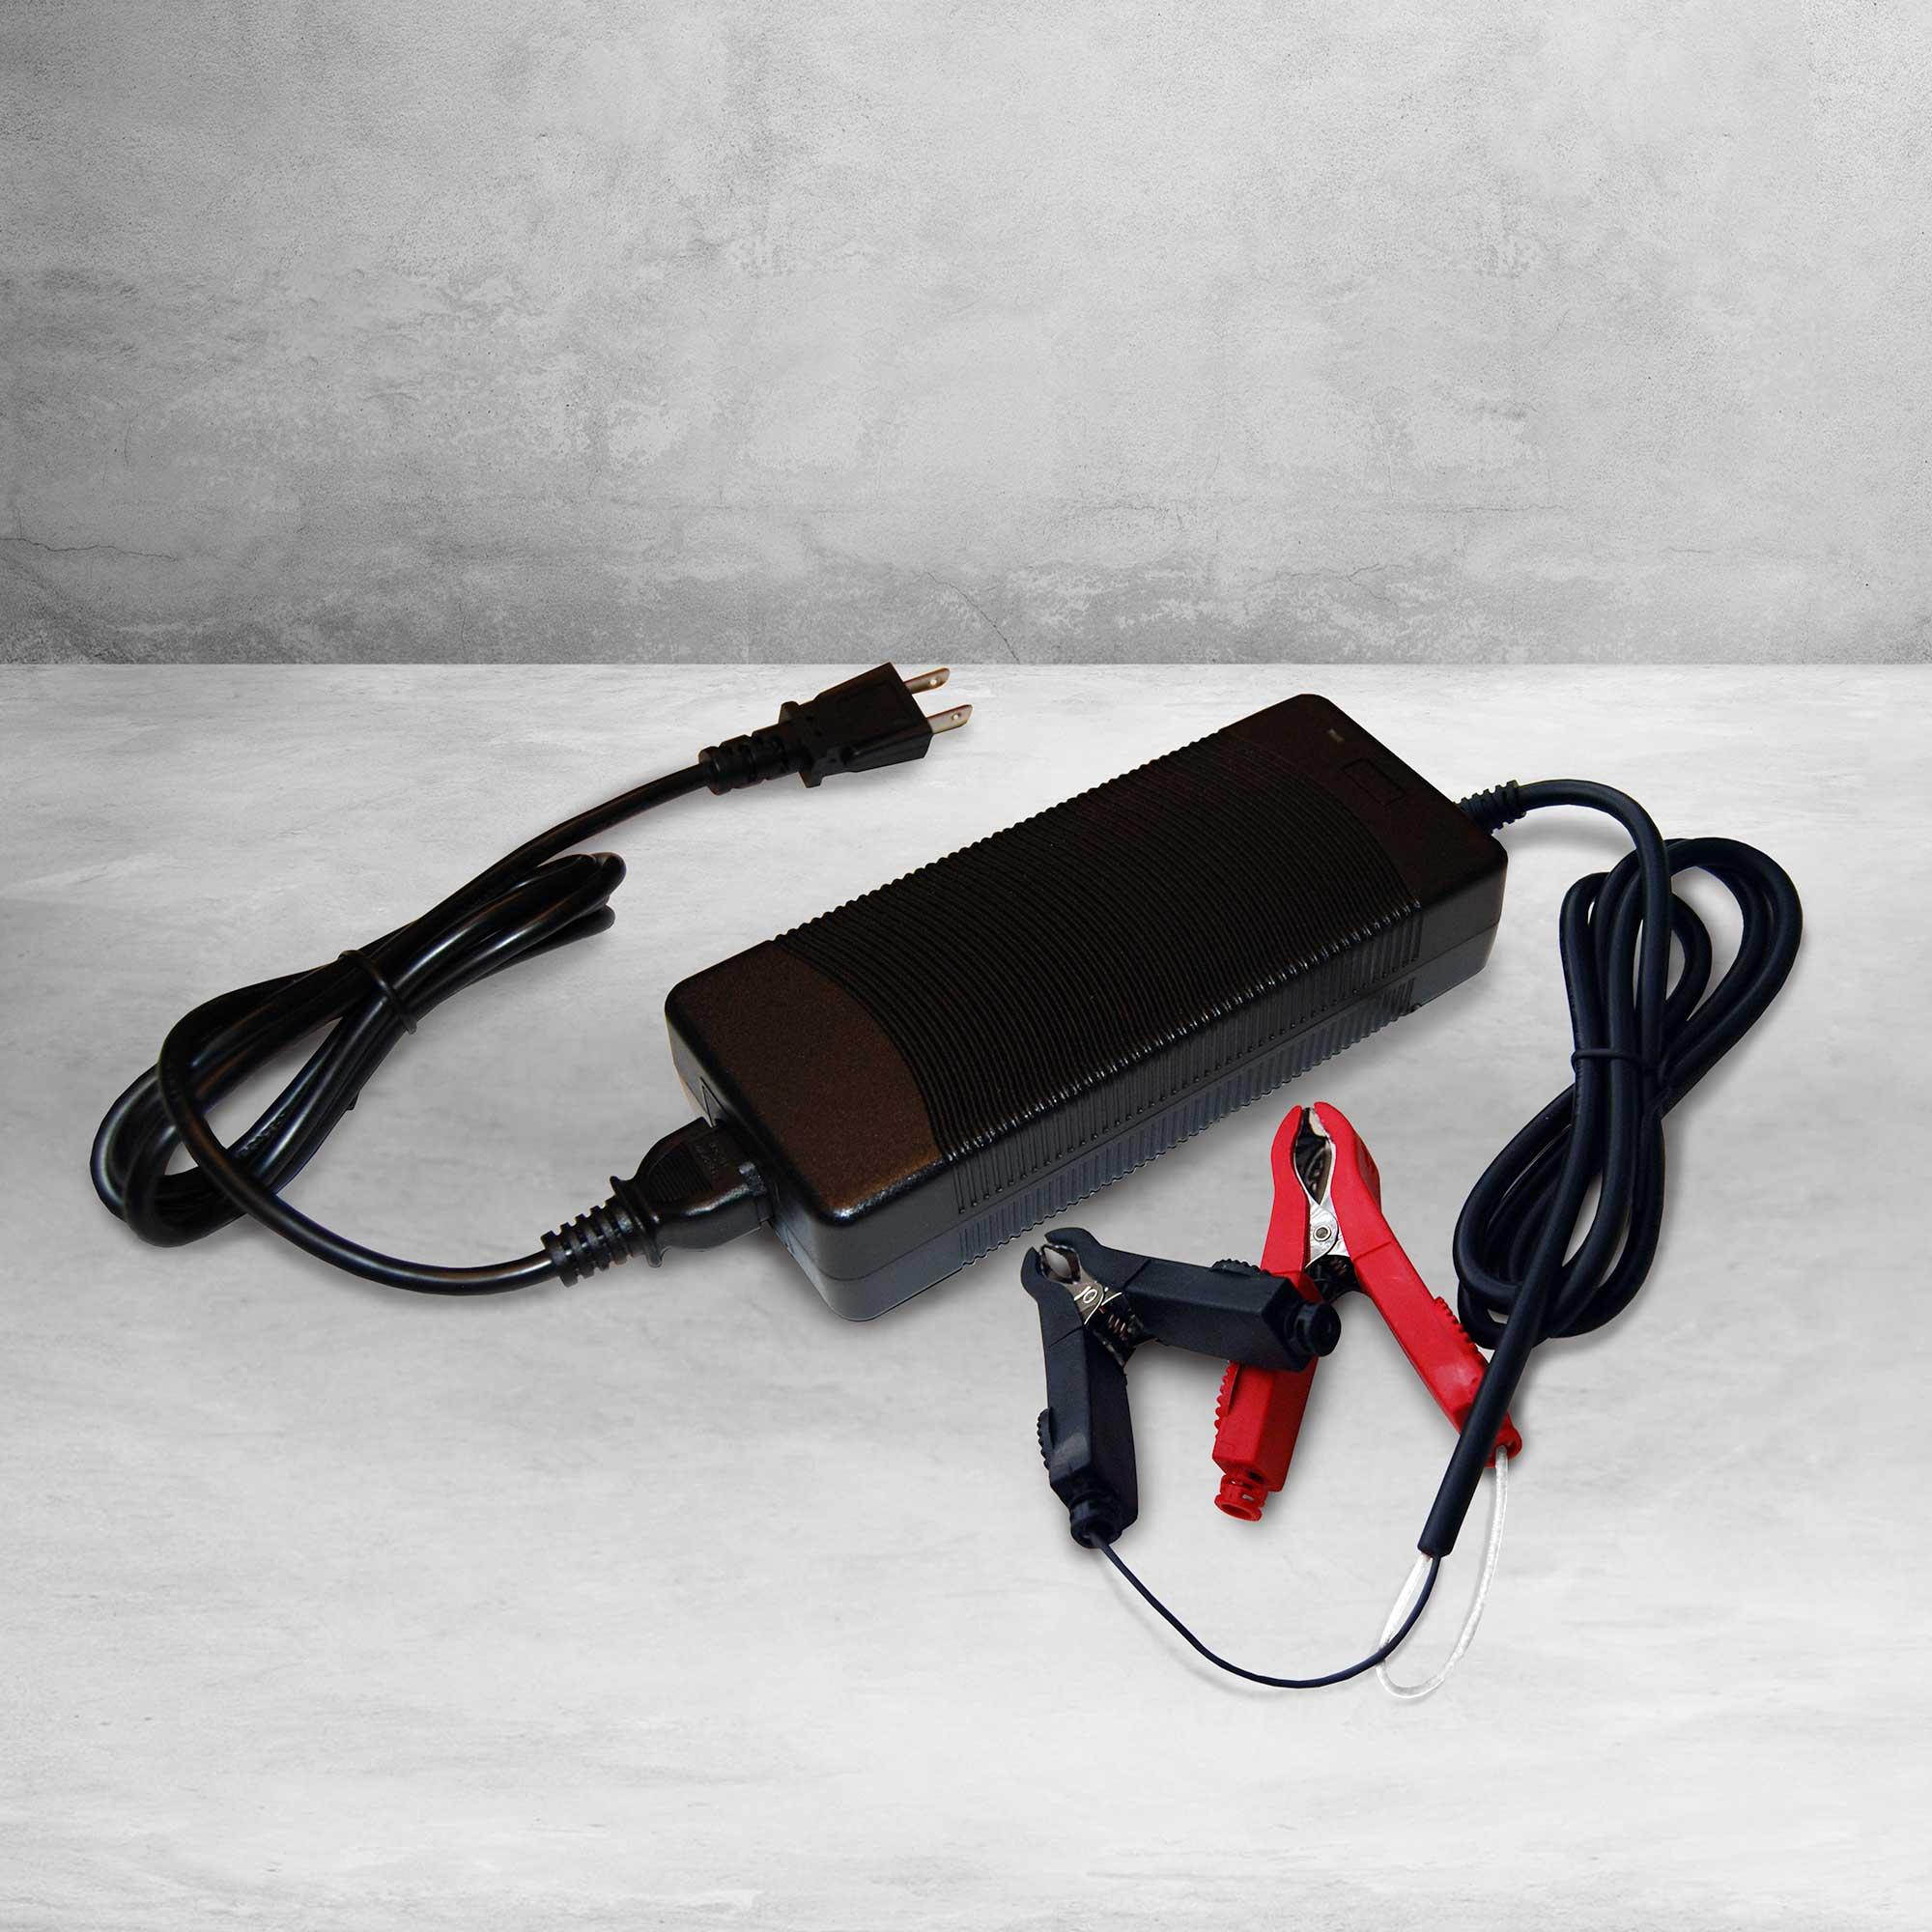 Dakota Lithium 12v 10A Battery Charger